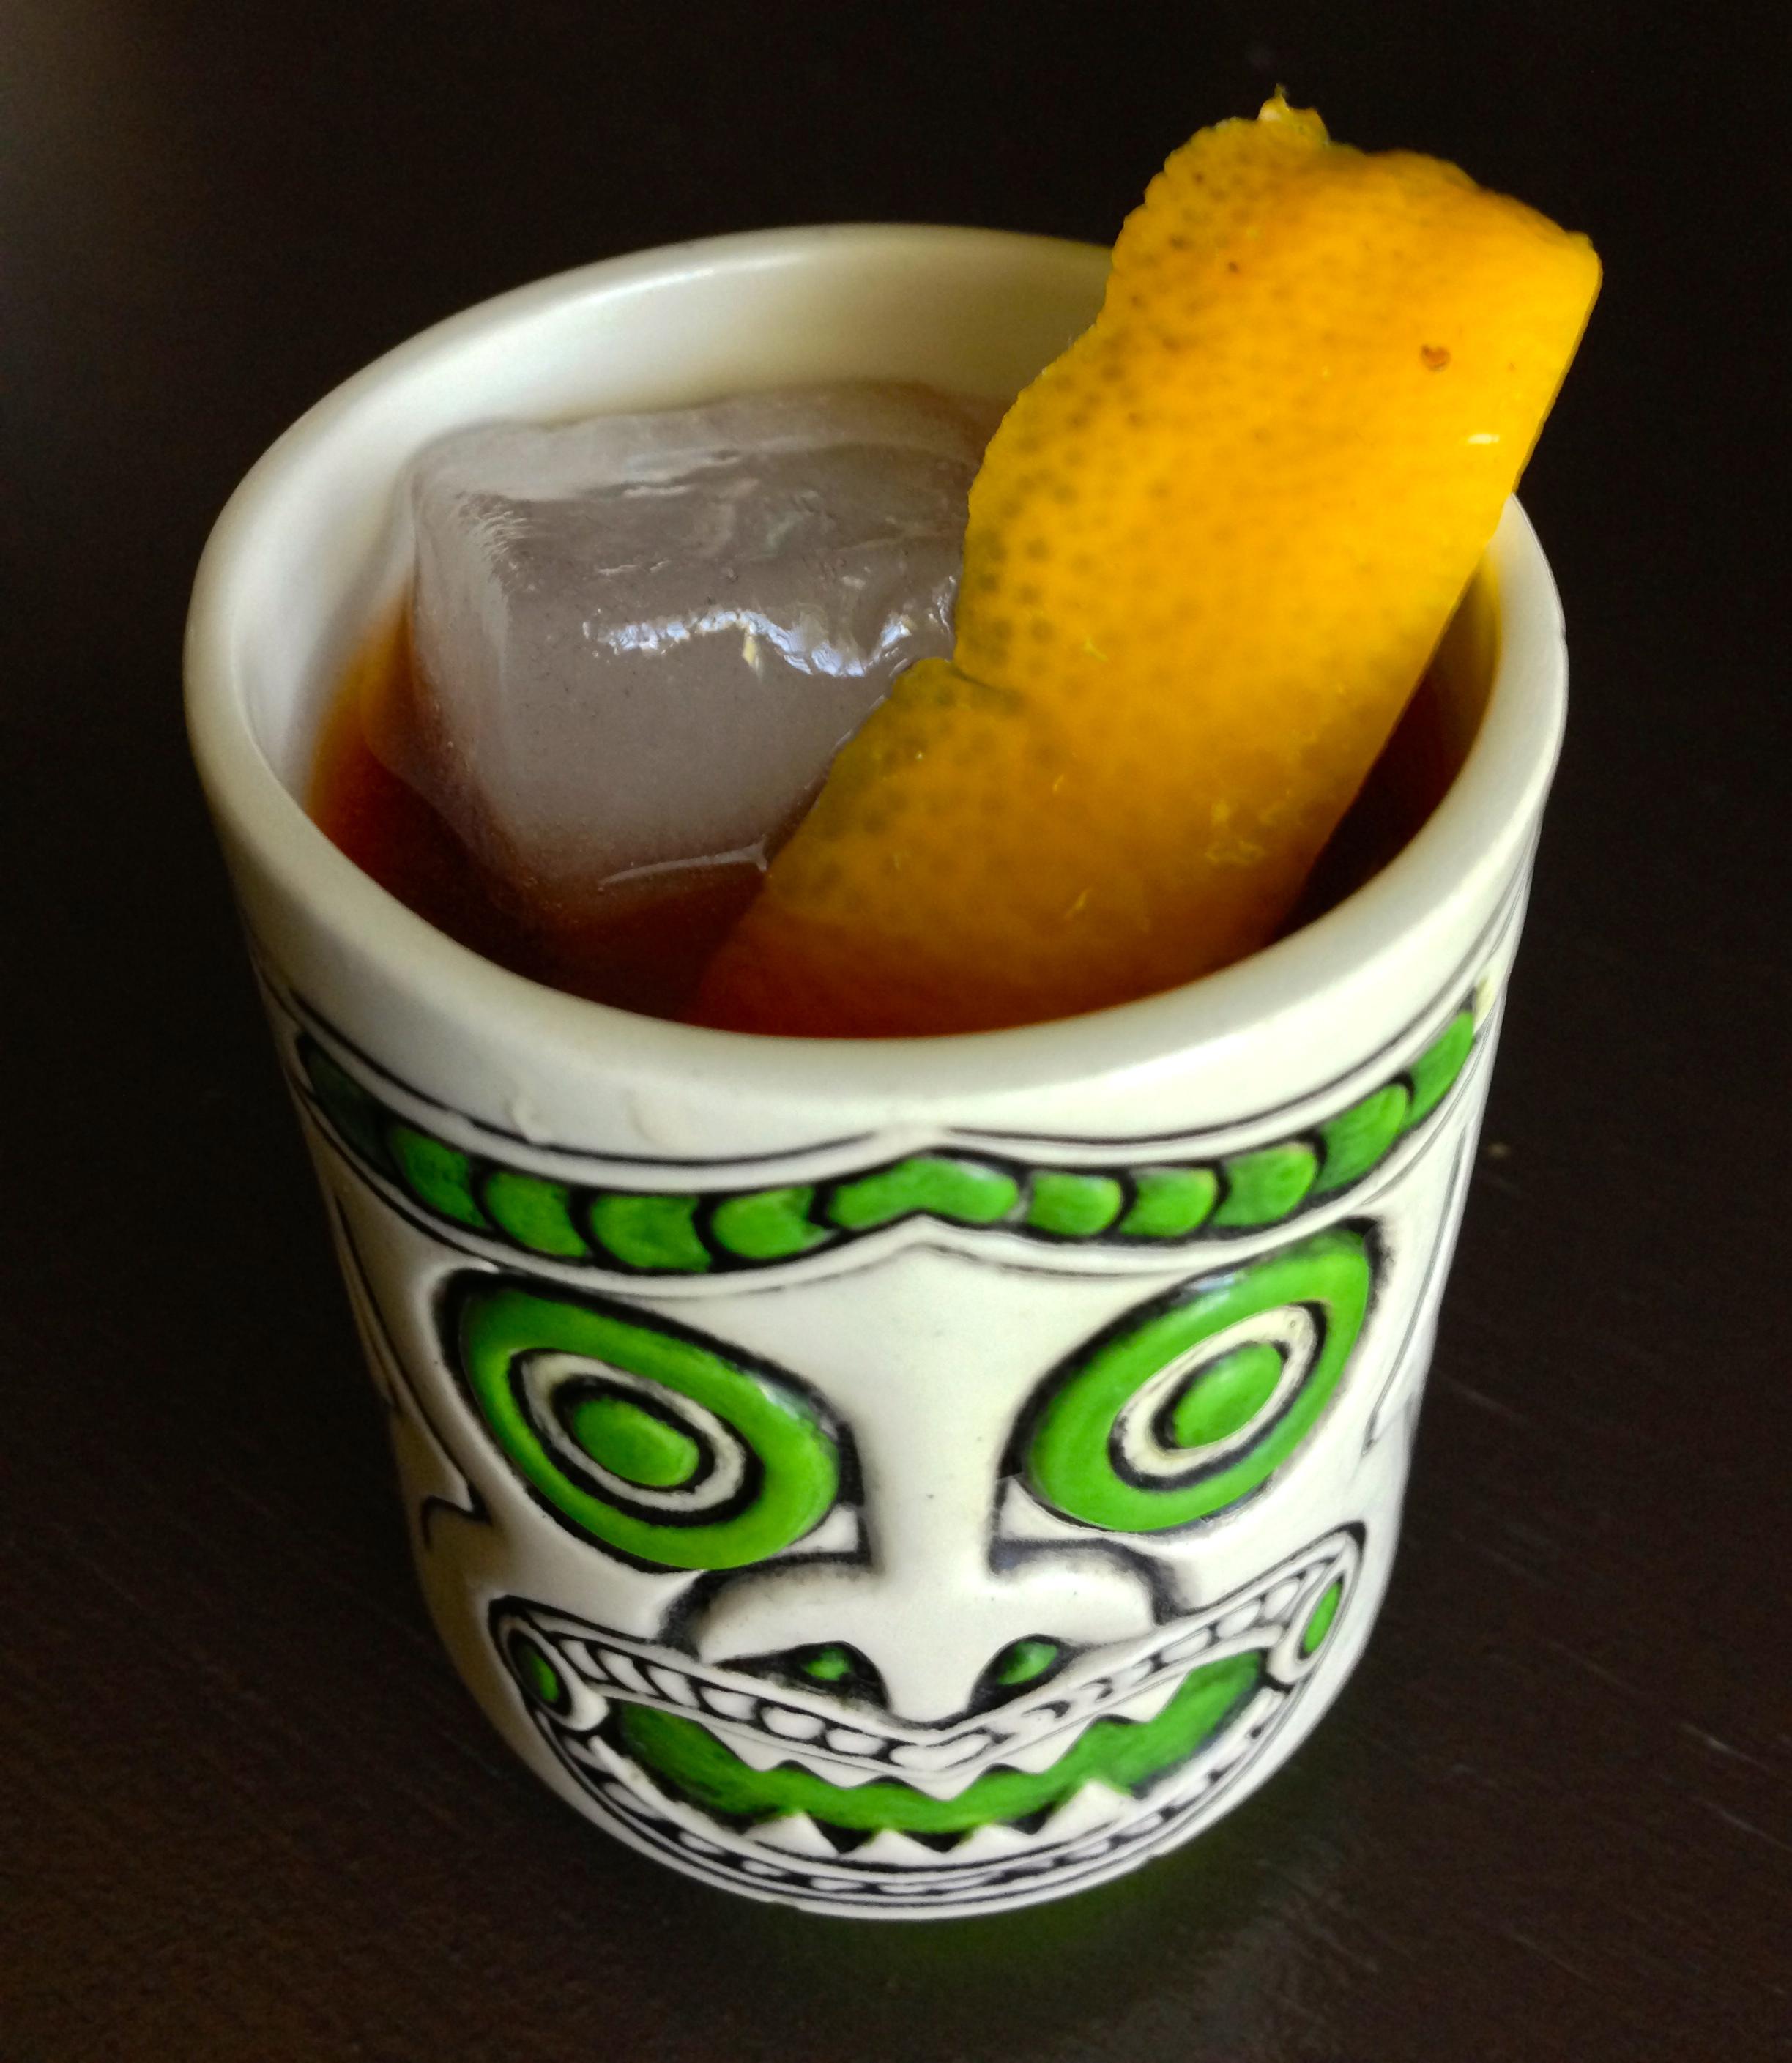 Lemon Grog or a similar grog should be in everyones tiki drink black book.